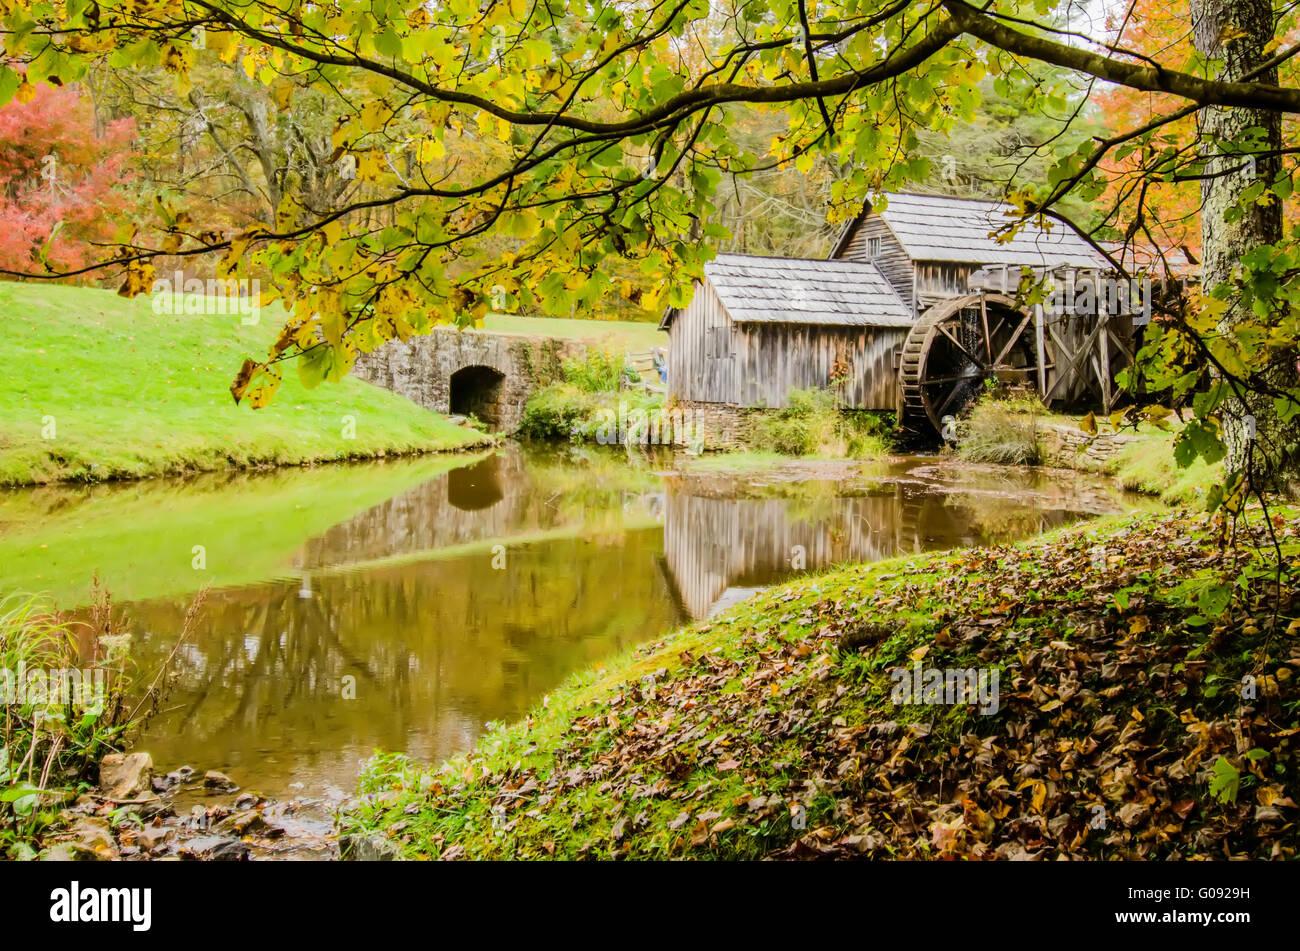 Virginia's Mabry Mill on the Blue Ridge Parkway in the Autumn season - Stock Image